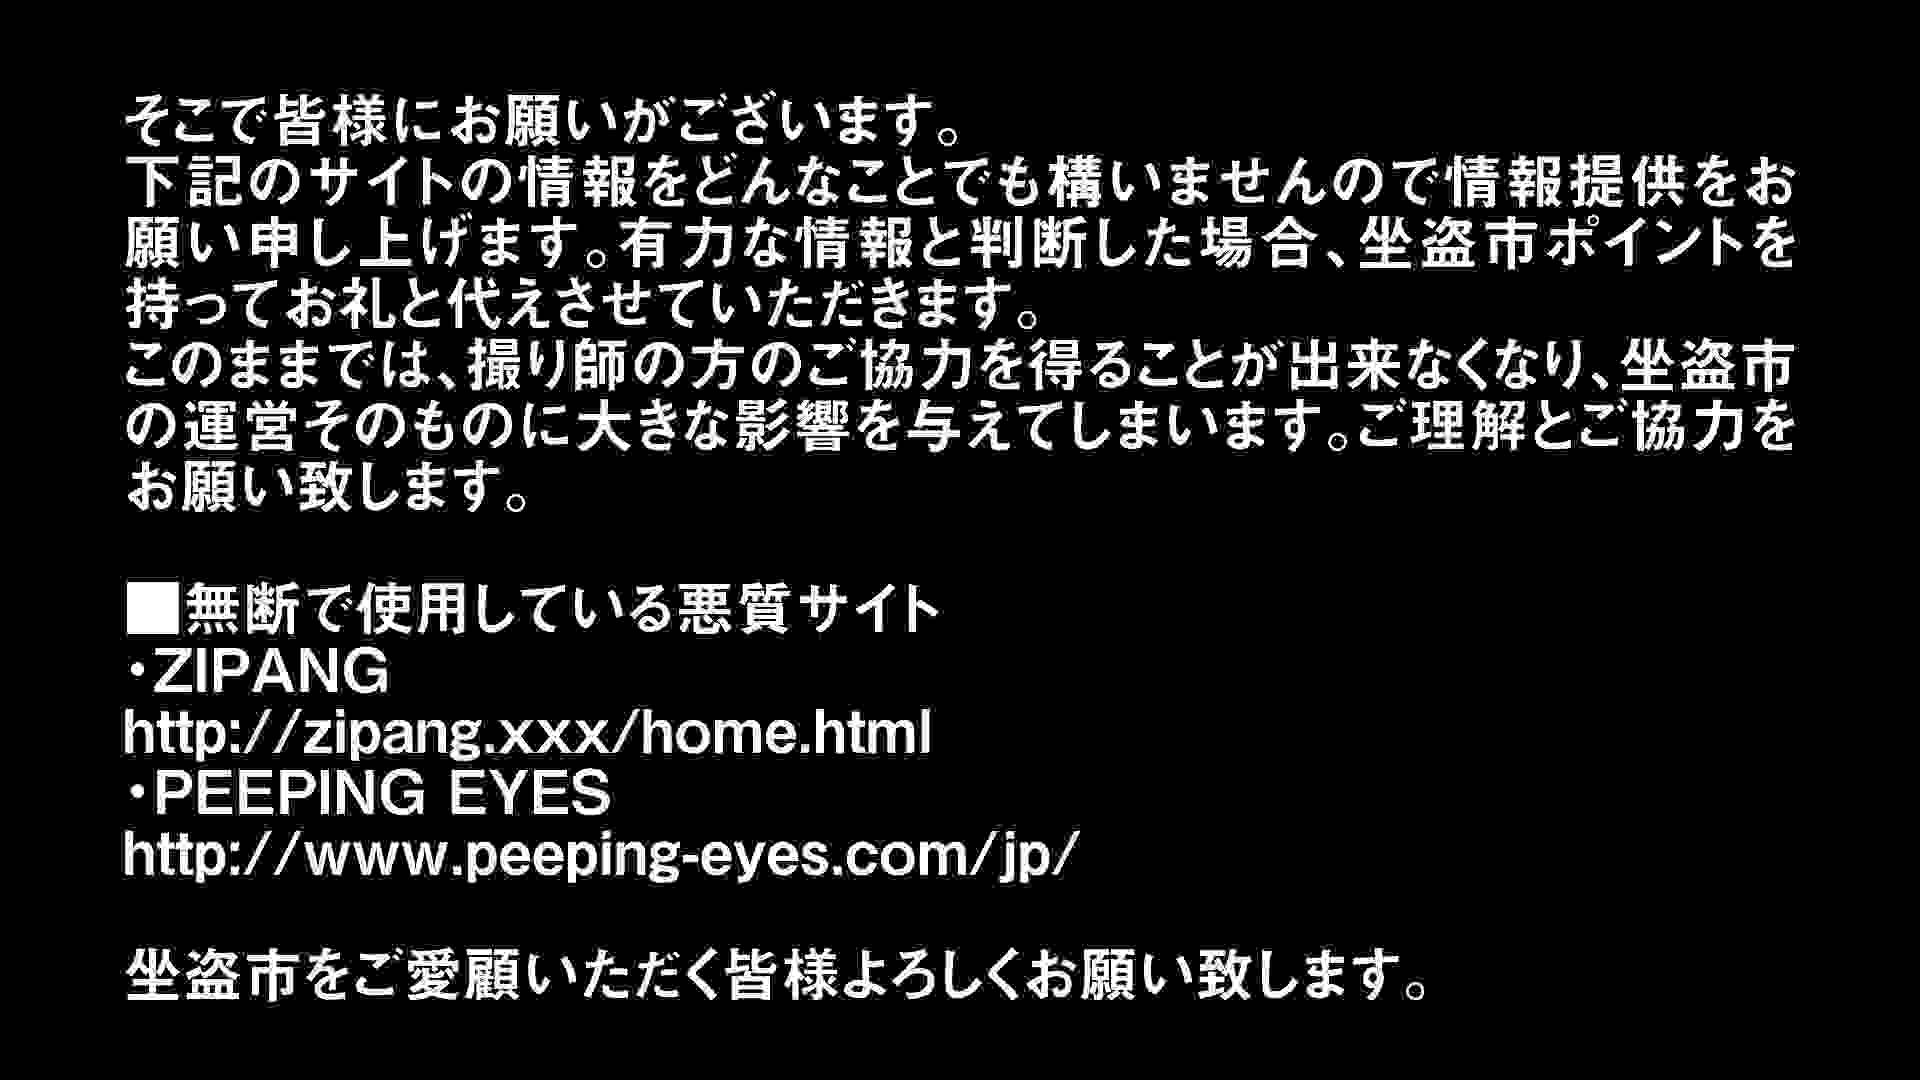 Aquaな露天風呂Vol.298 女体盗撮 | OL女体  60連発 19